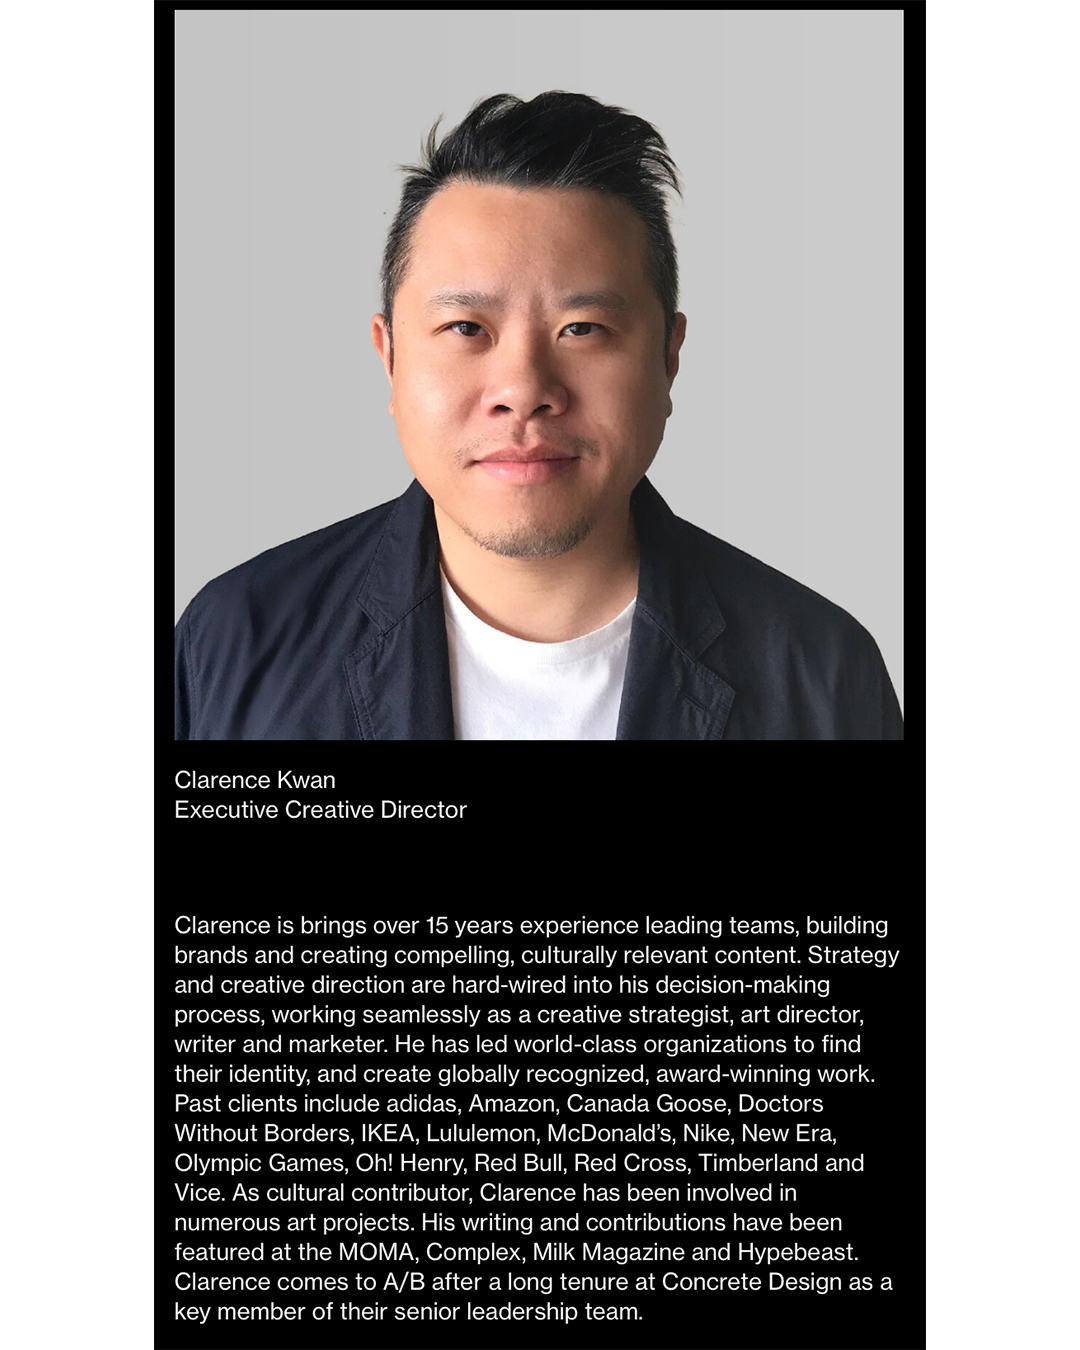 Screenshot of Clarence Kwan's bio describing his professional background.